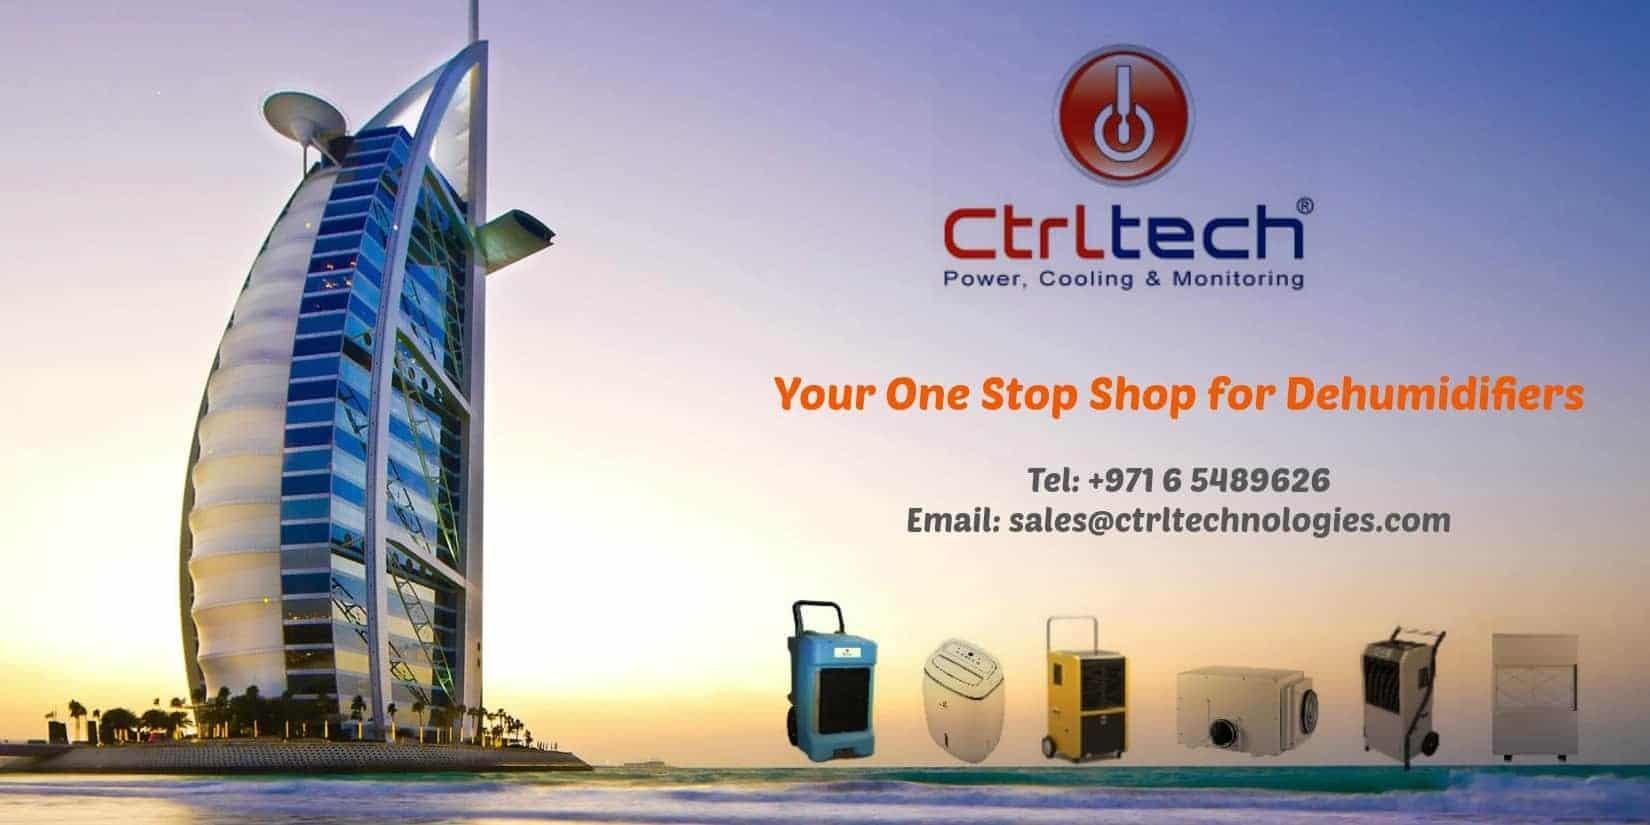 Dehumidifier Dubai, UAE for Dehumidification.